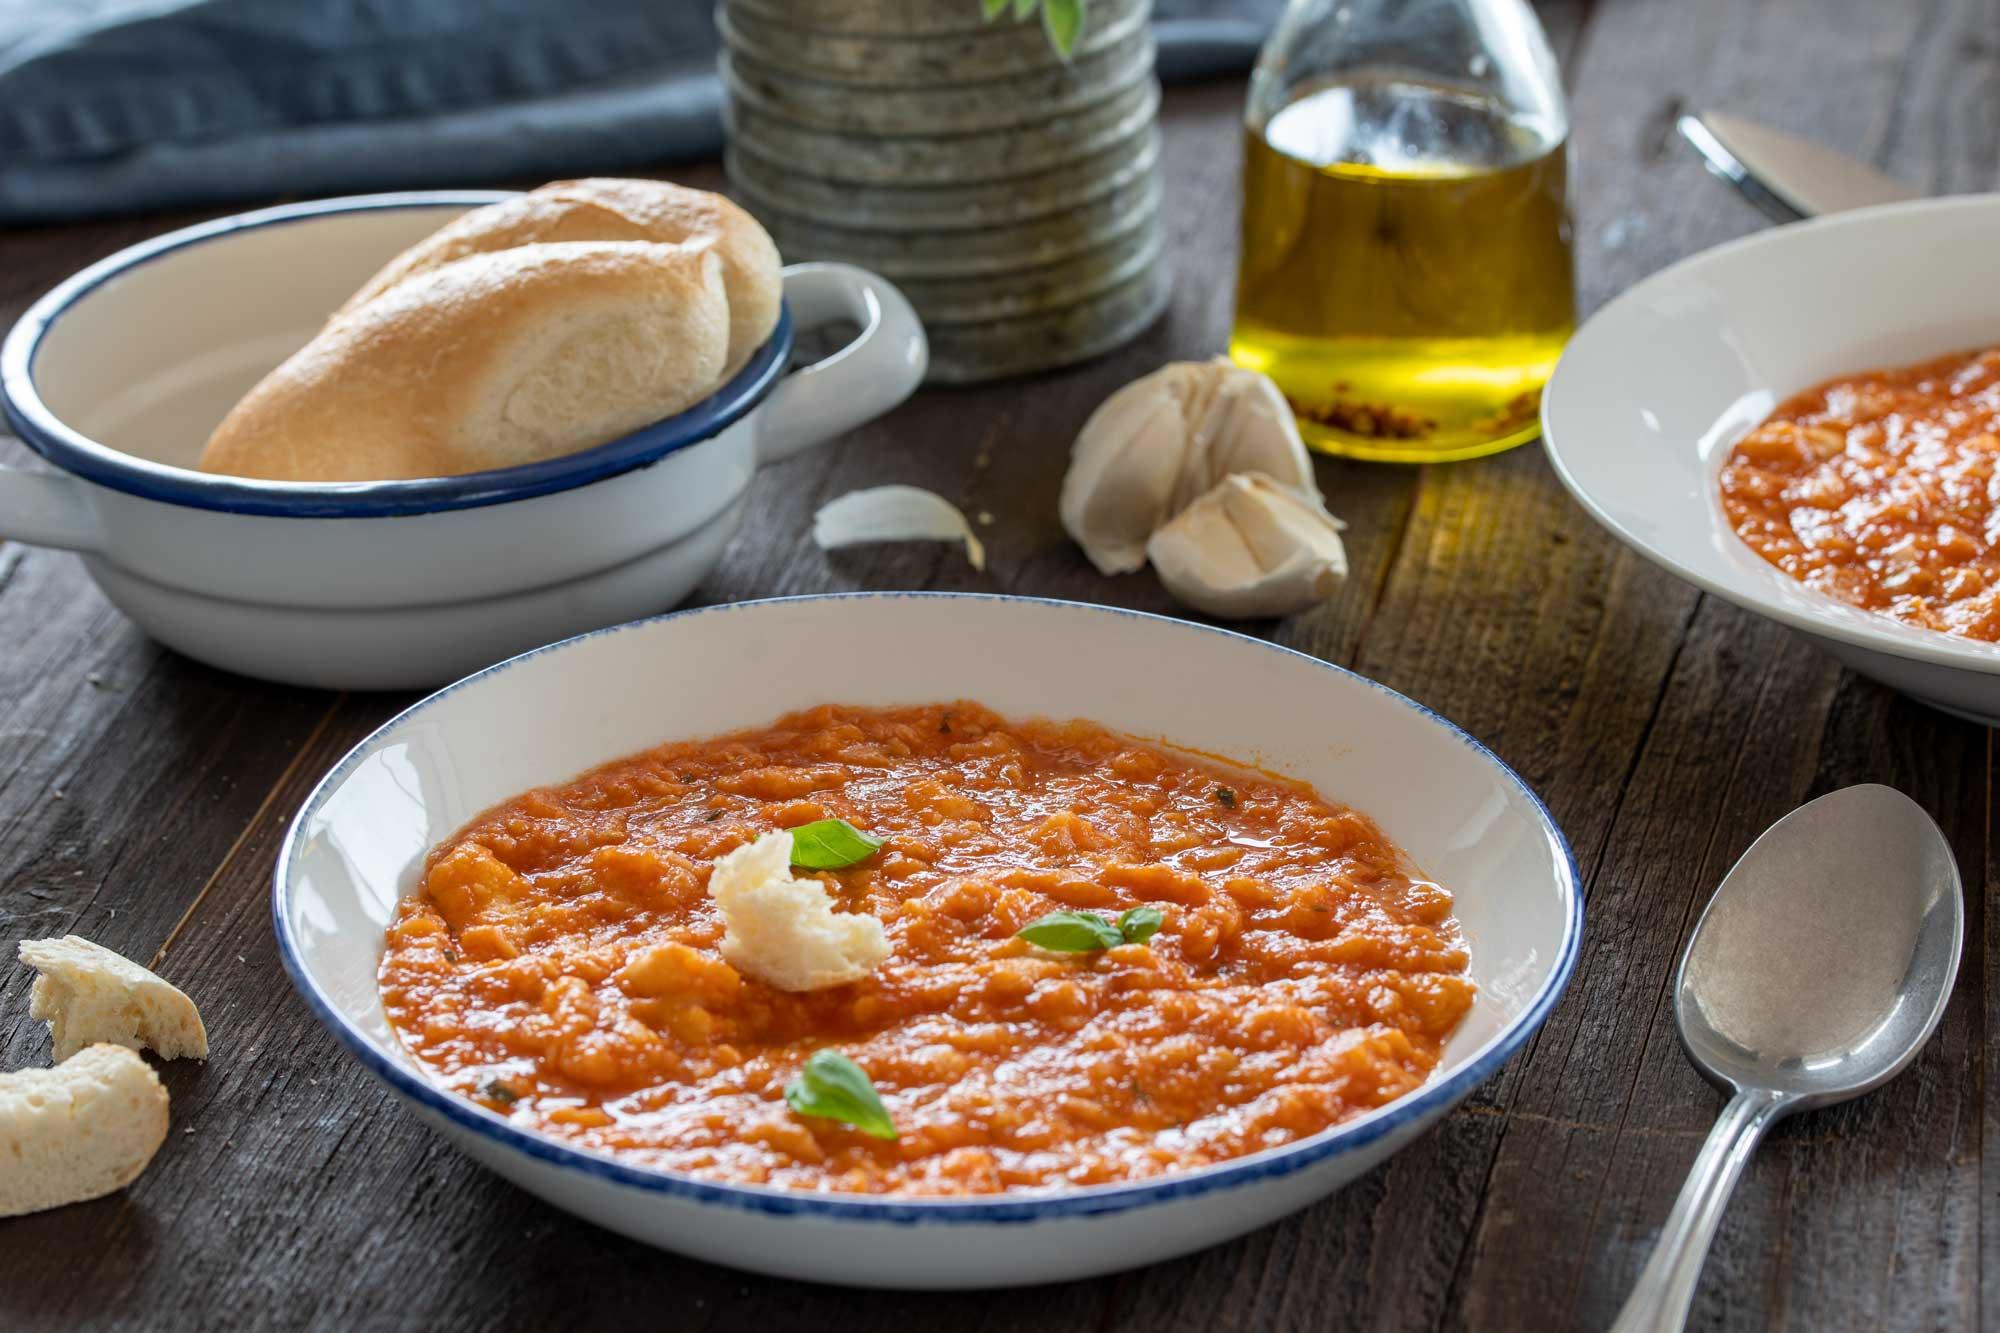 Paradižnikova juha s kruhom ali Pappa al Pomodoro